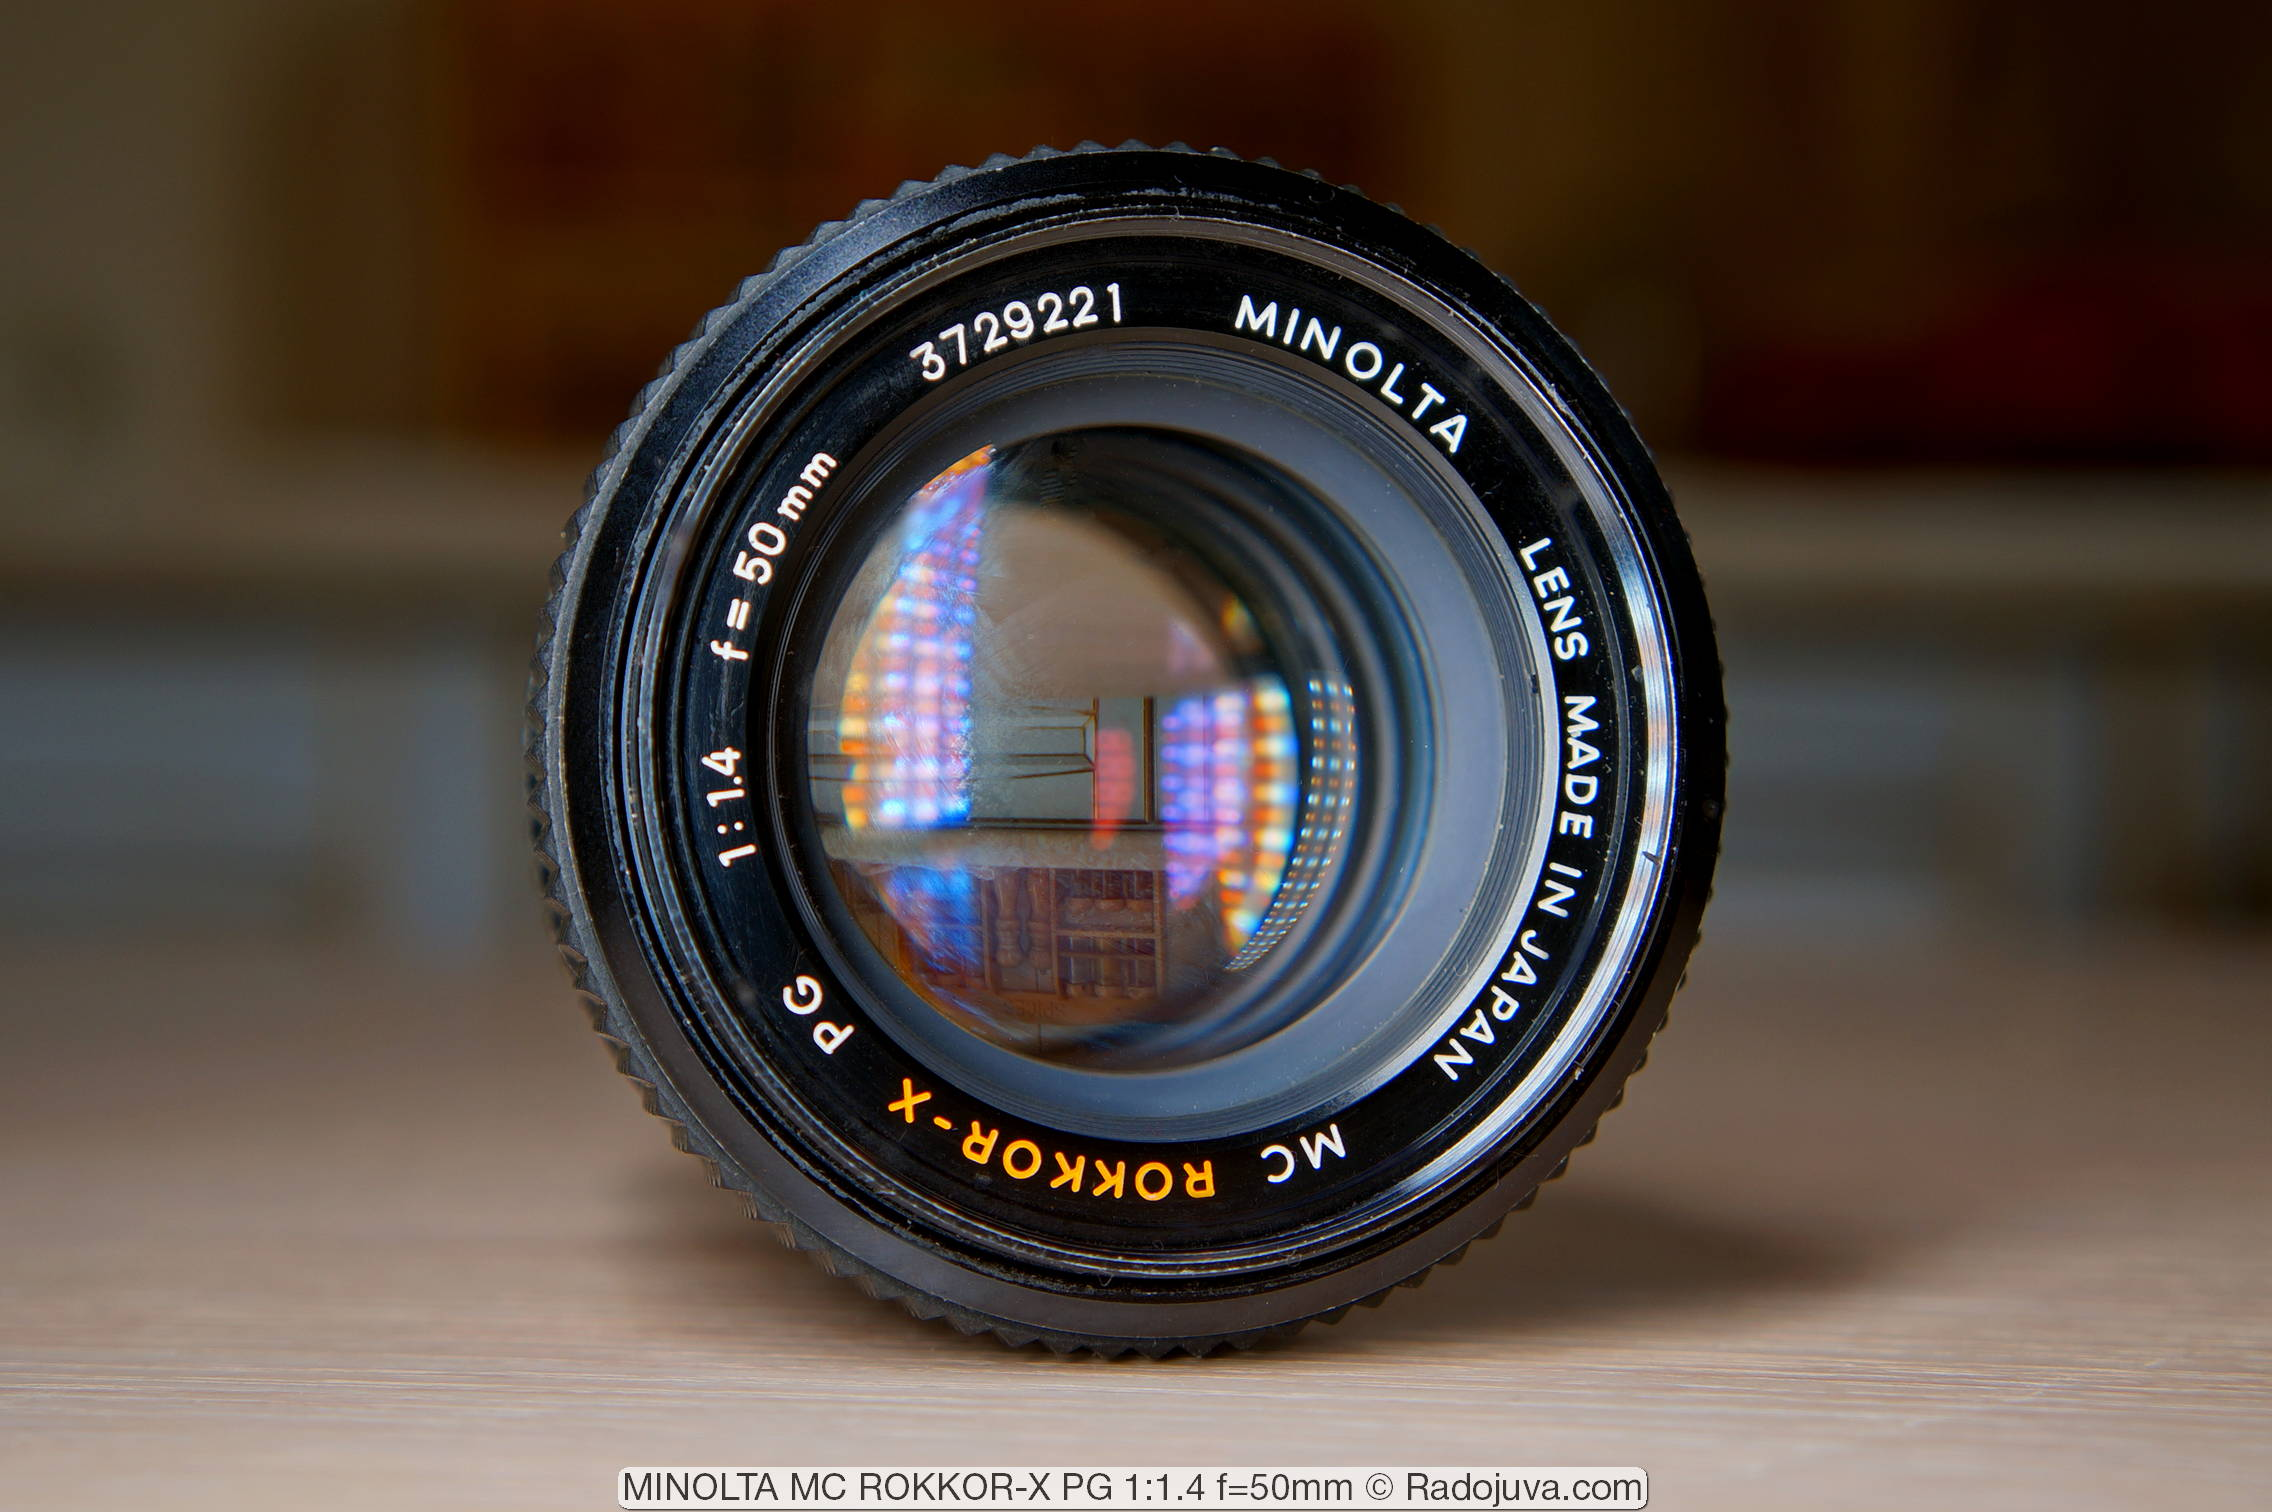 MINOLTA MC ROKKOR-X PG 1:1.4 f=50mm